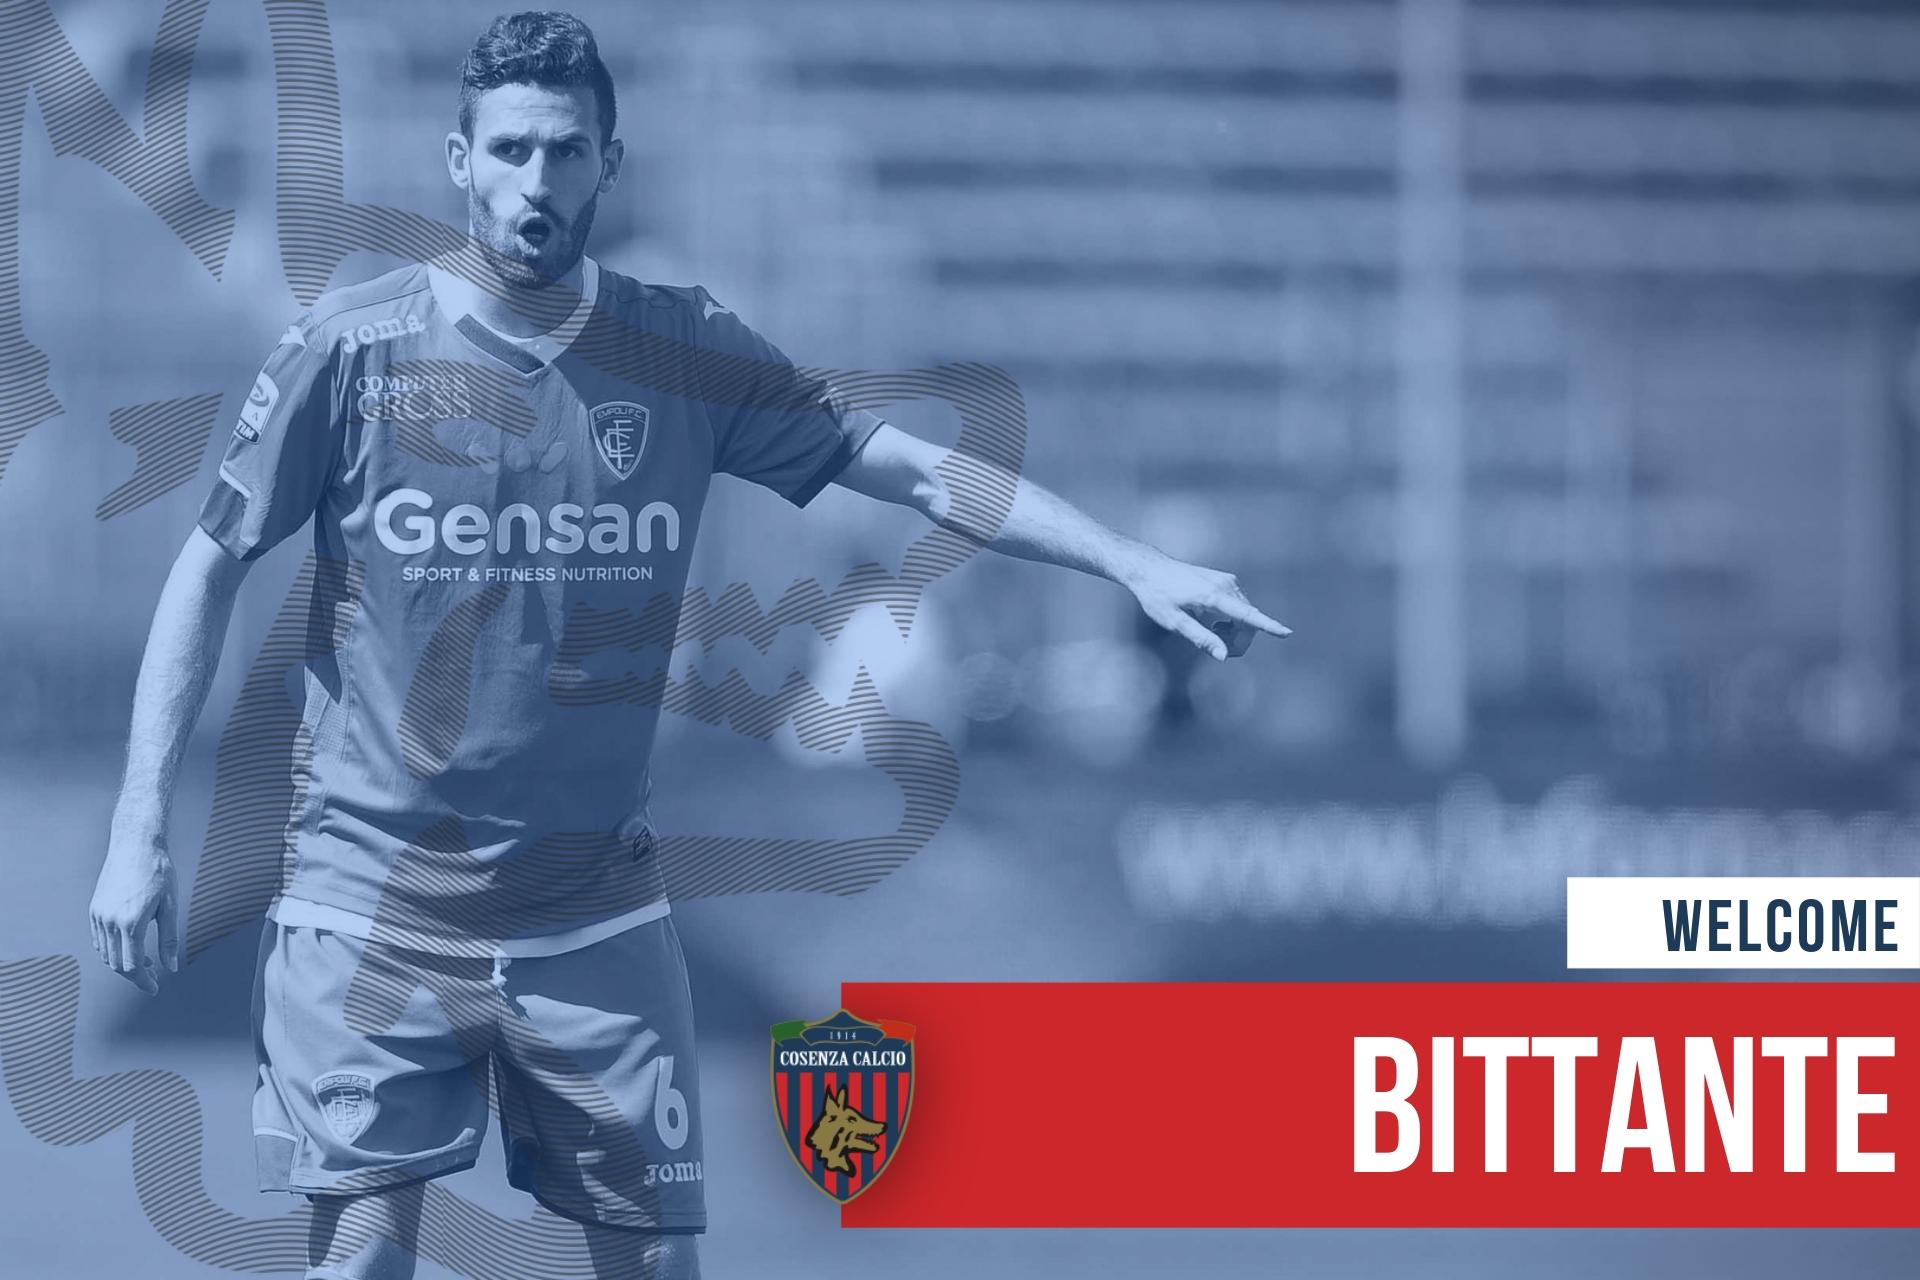 Luca Bittante